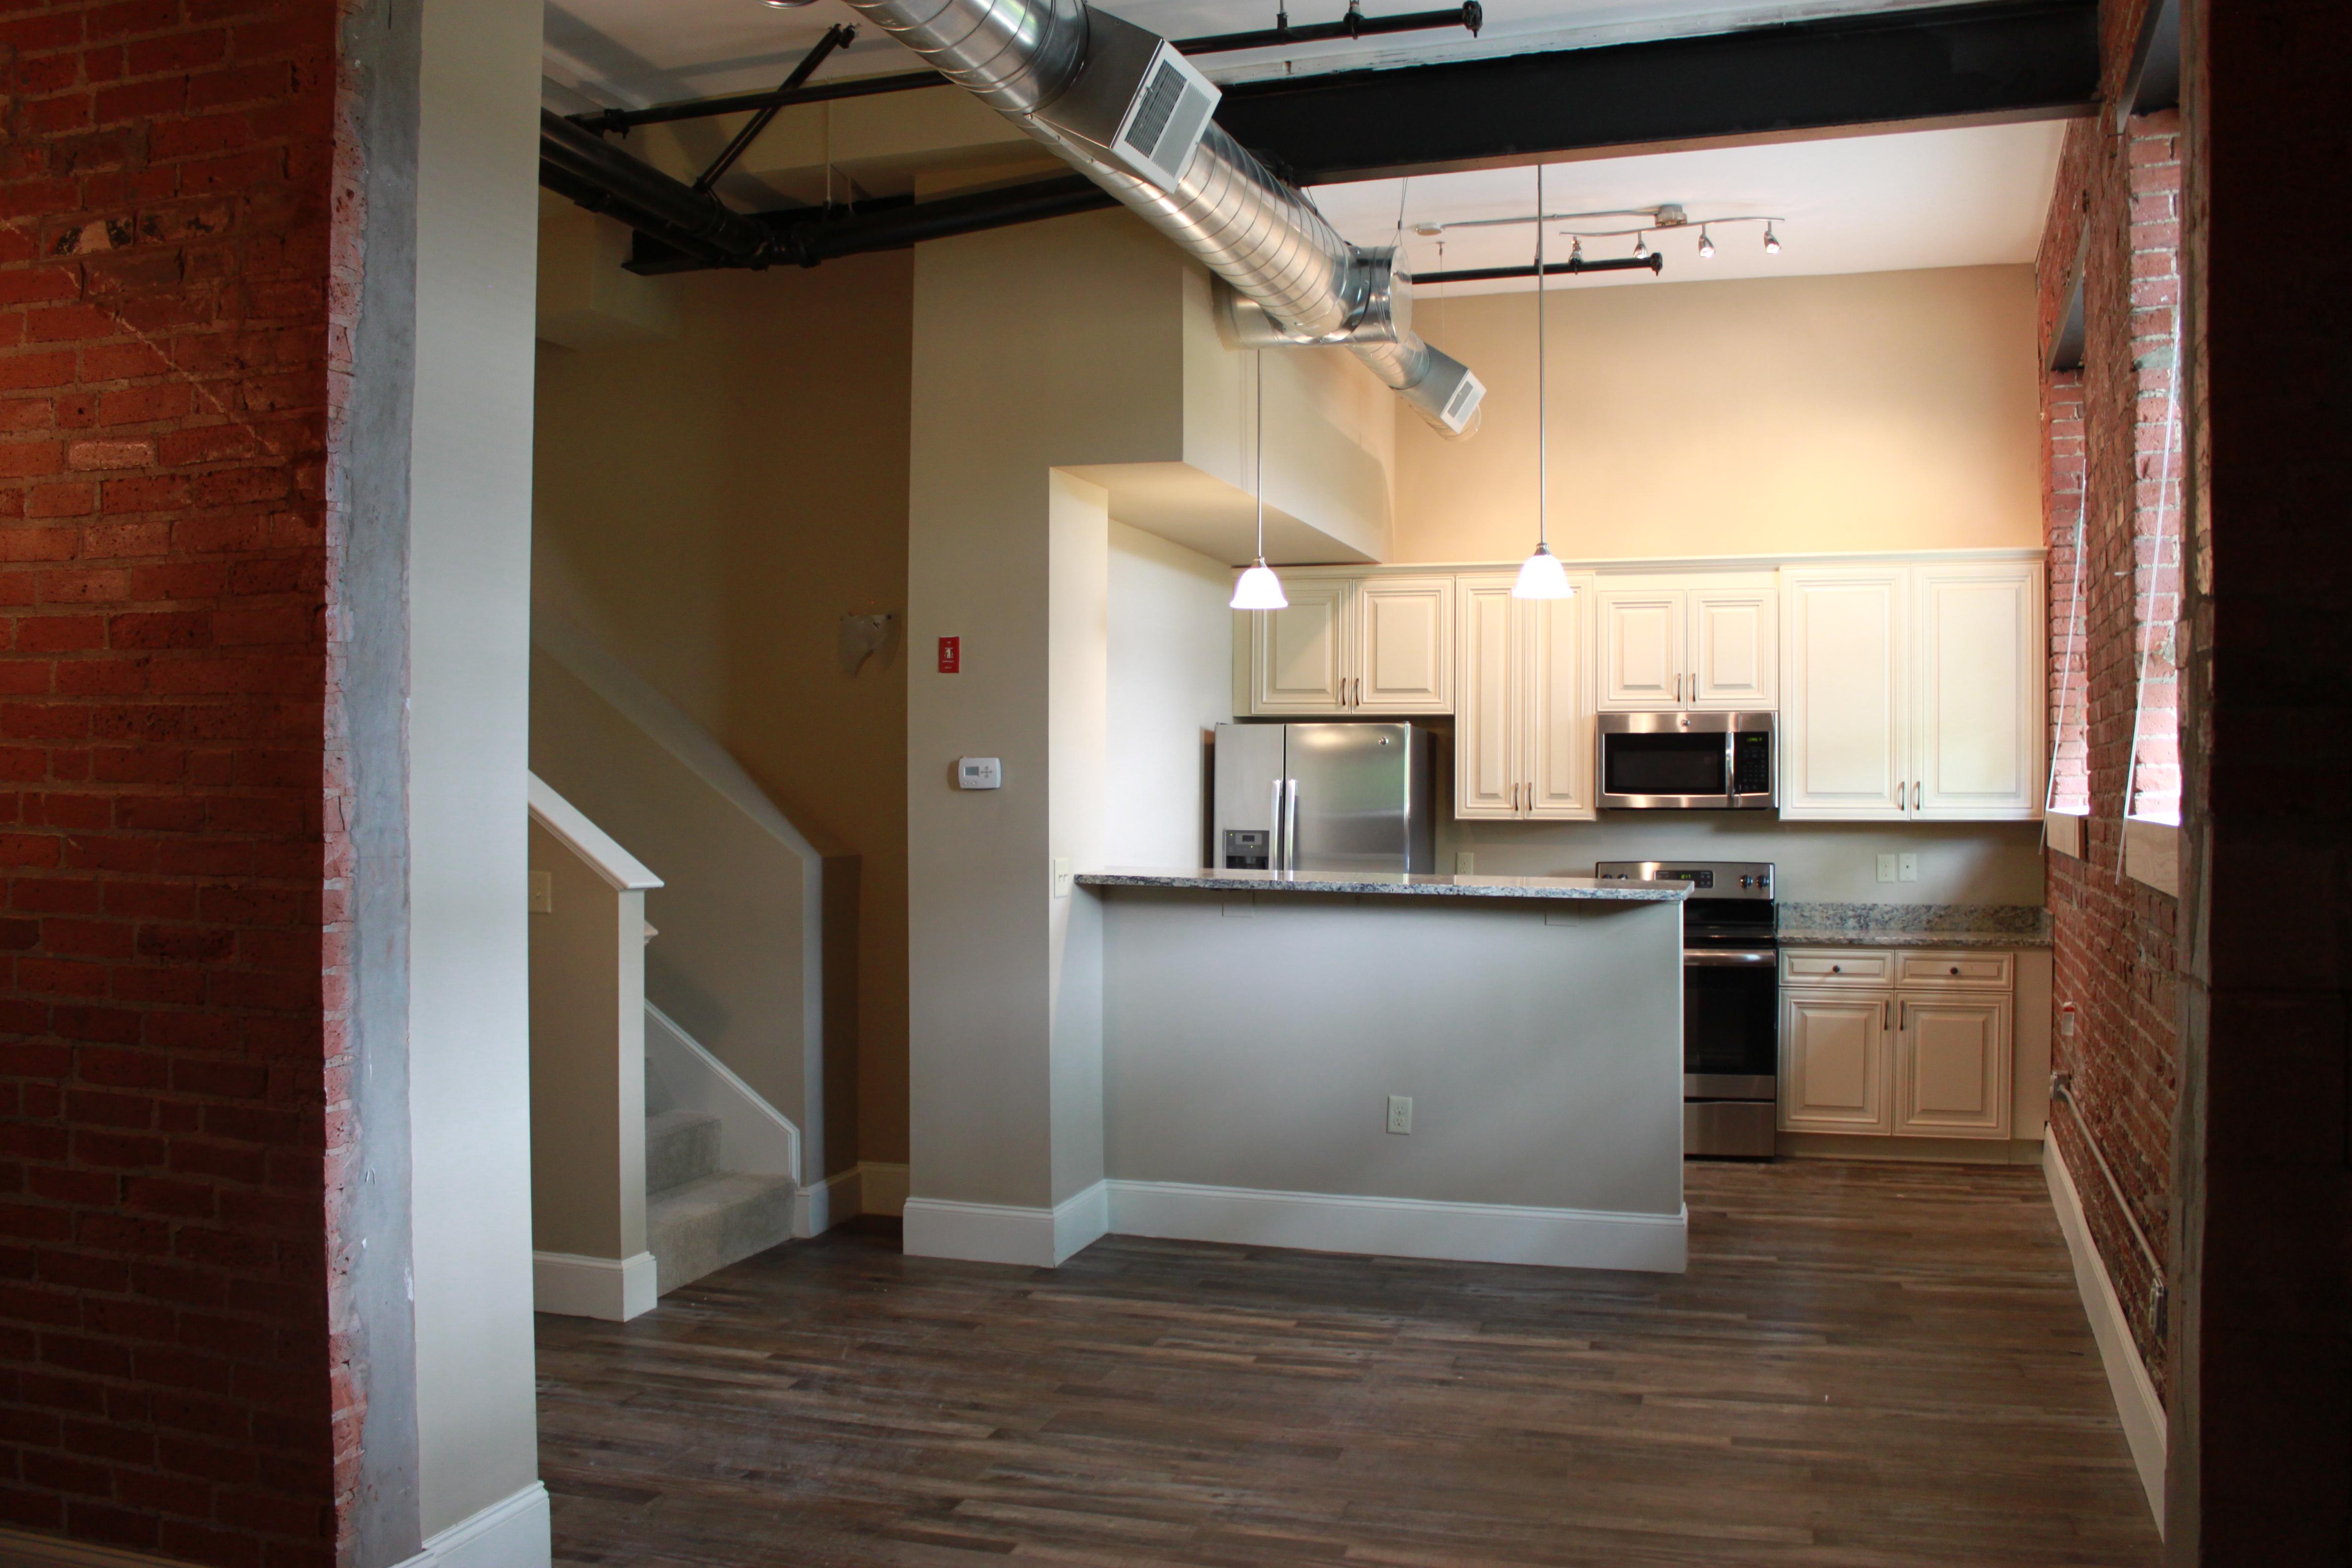 Commercial Insurance Brokers >> US Rubber Lofts - Providence, RI | Brady Sullivan Properties